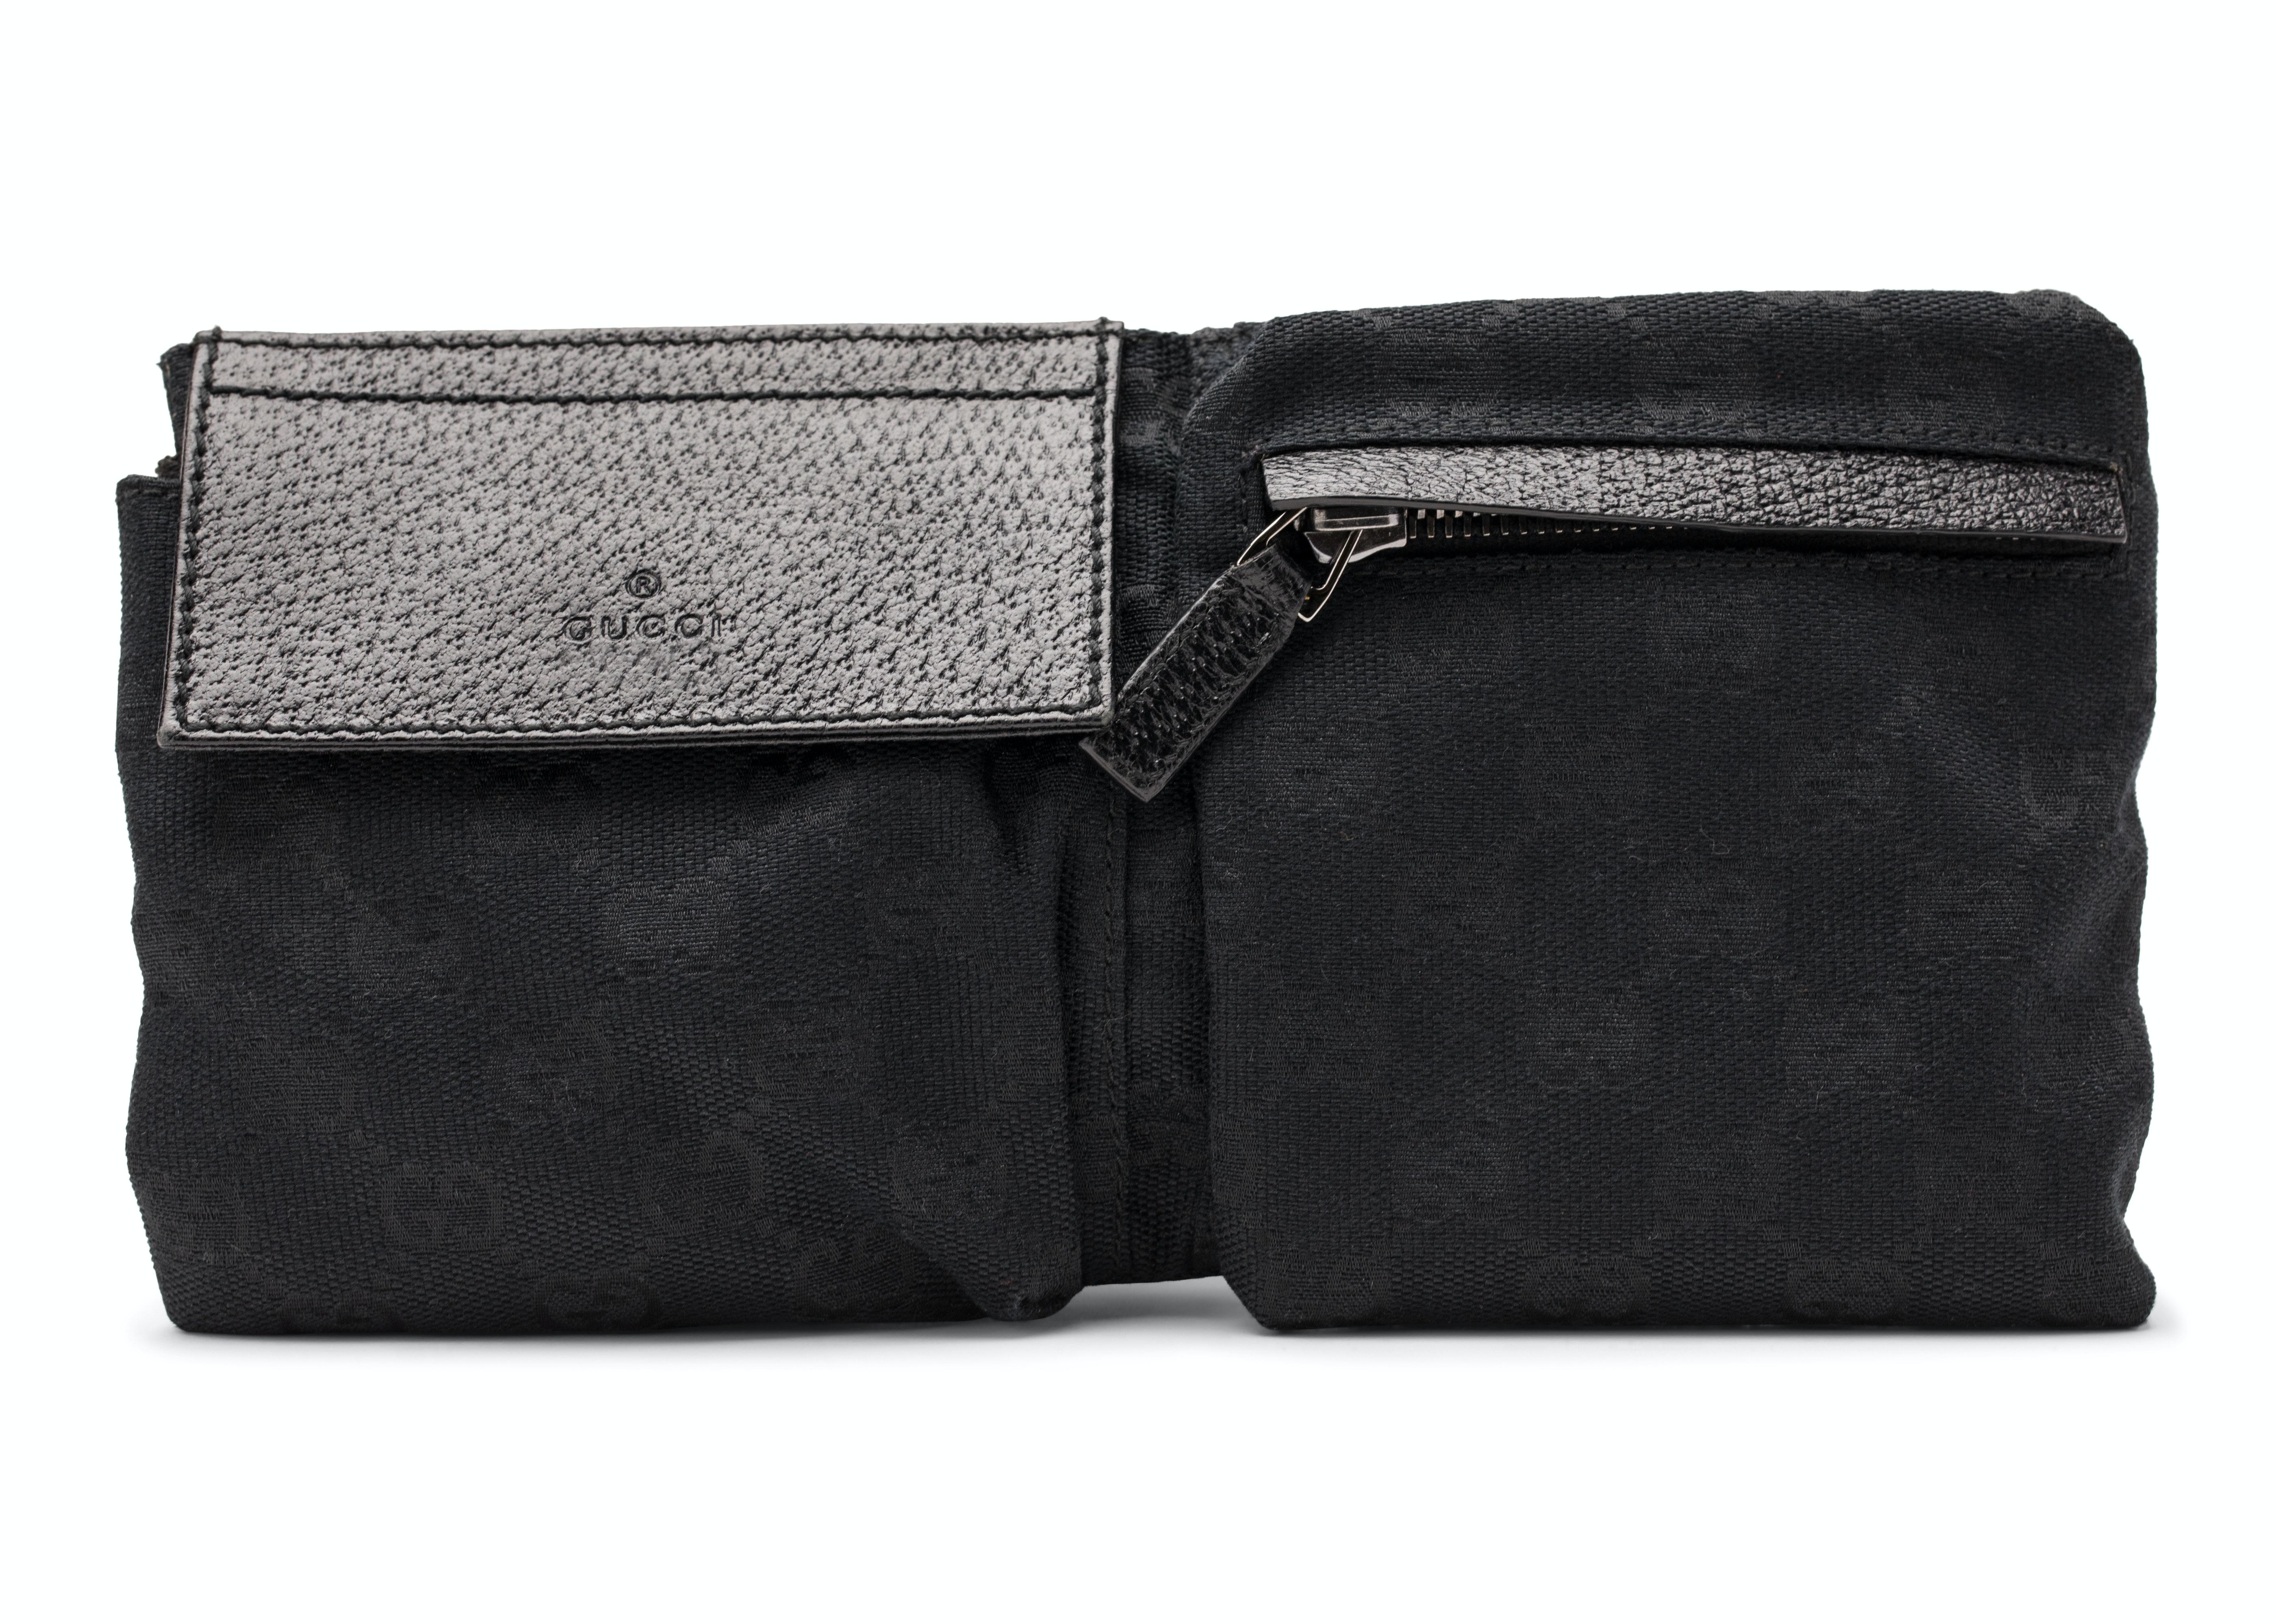 Gucci Waistbag Monogram GG Black